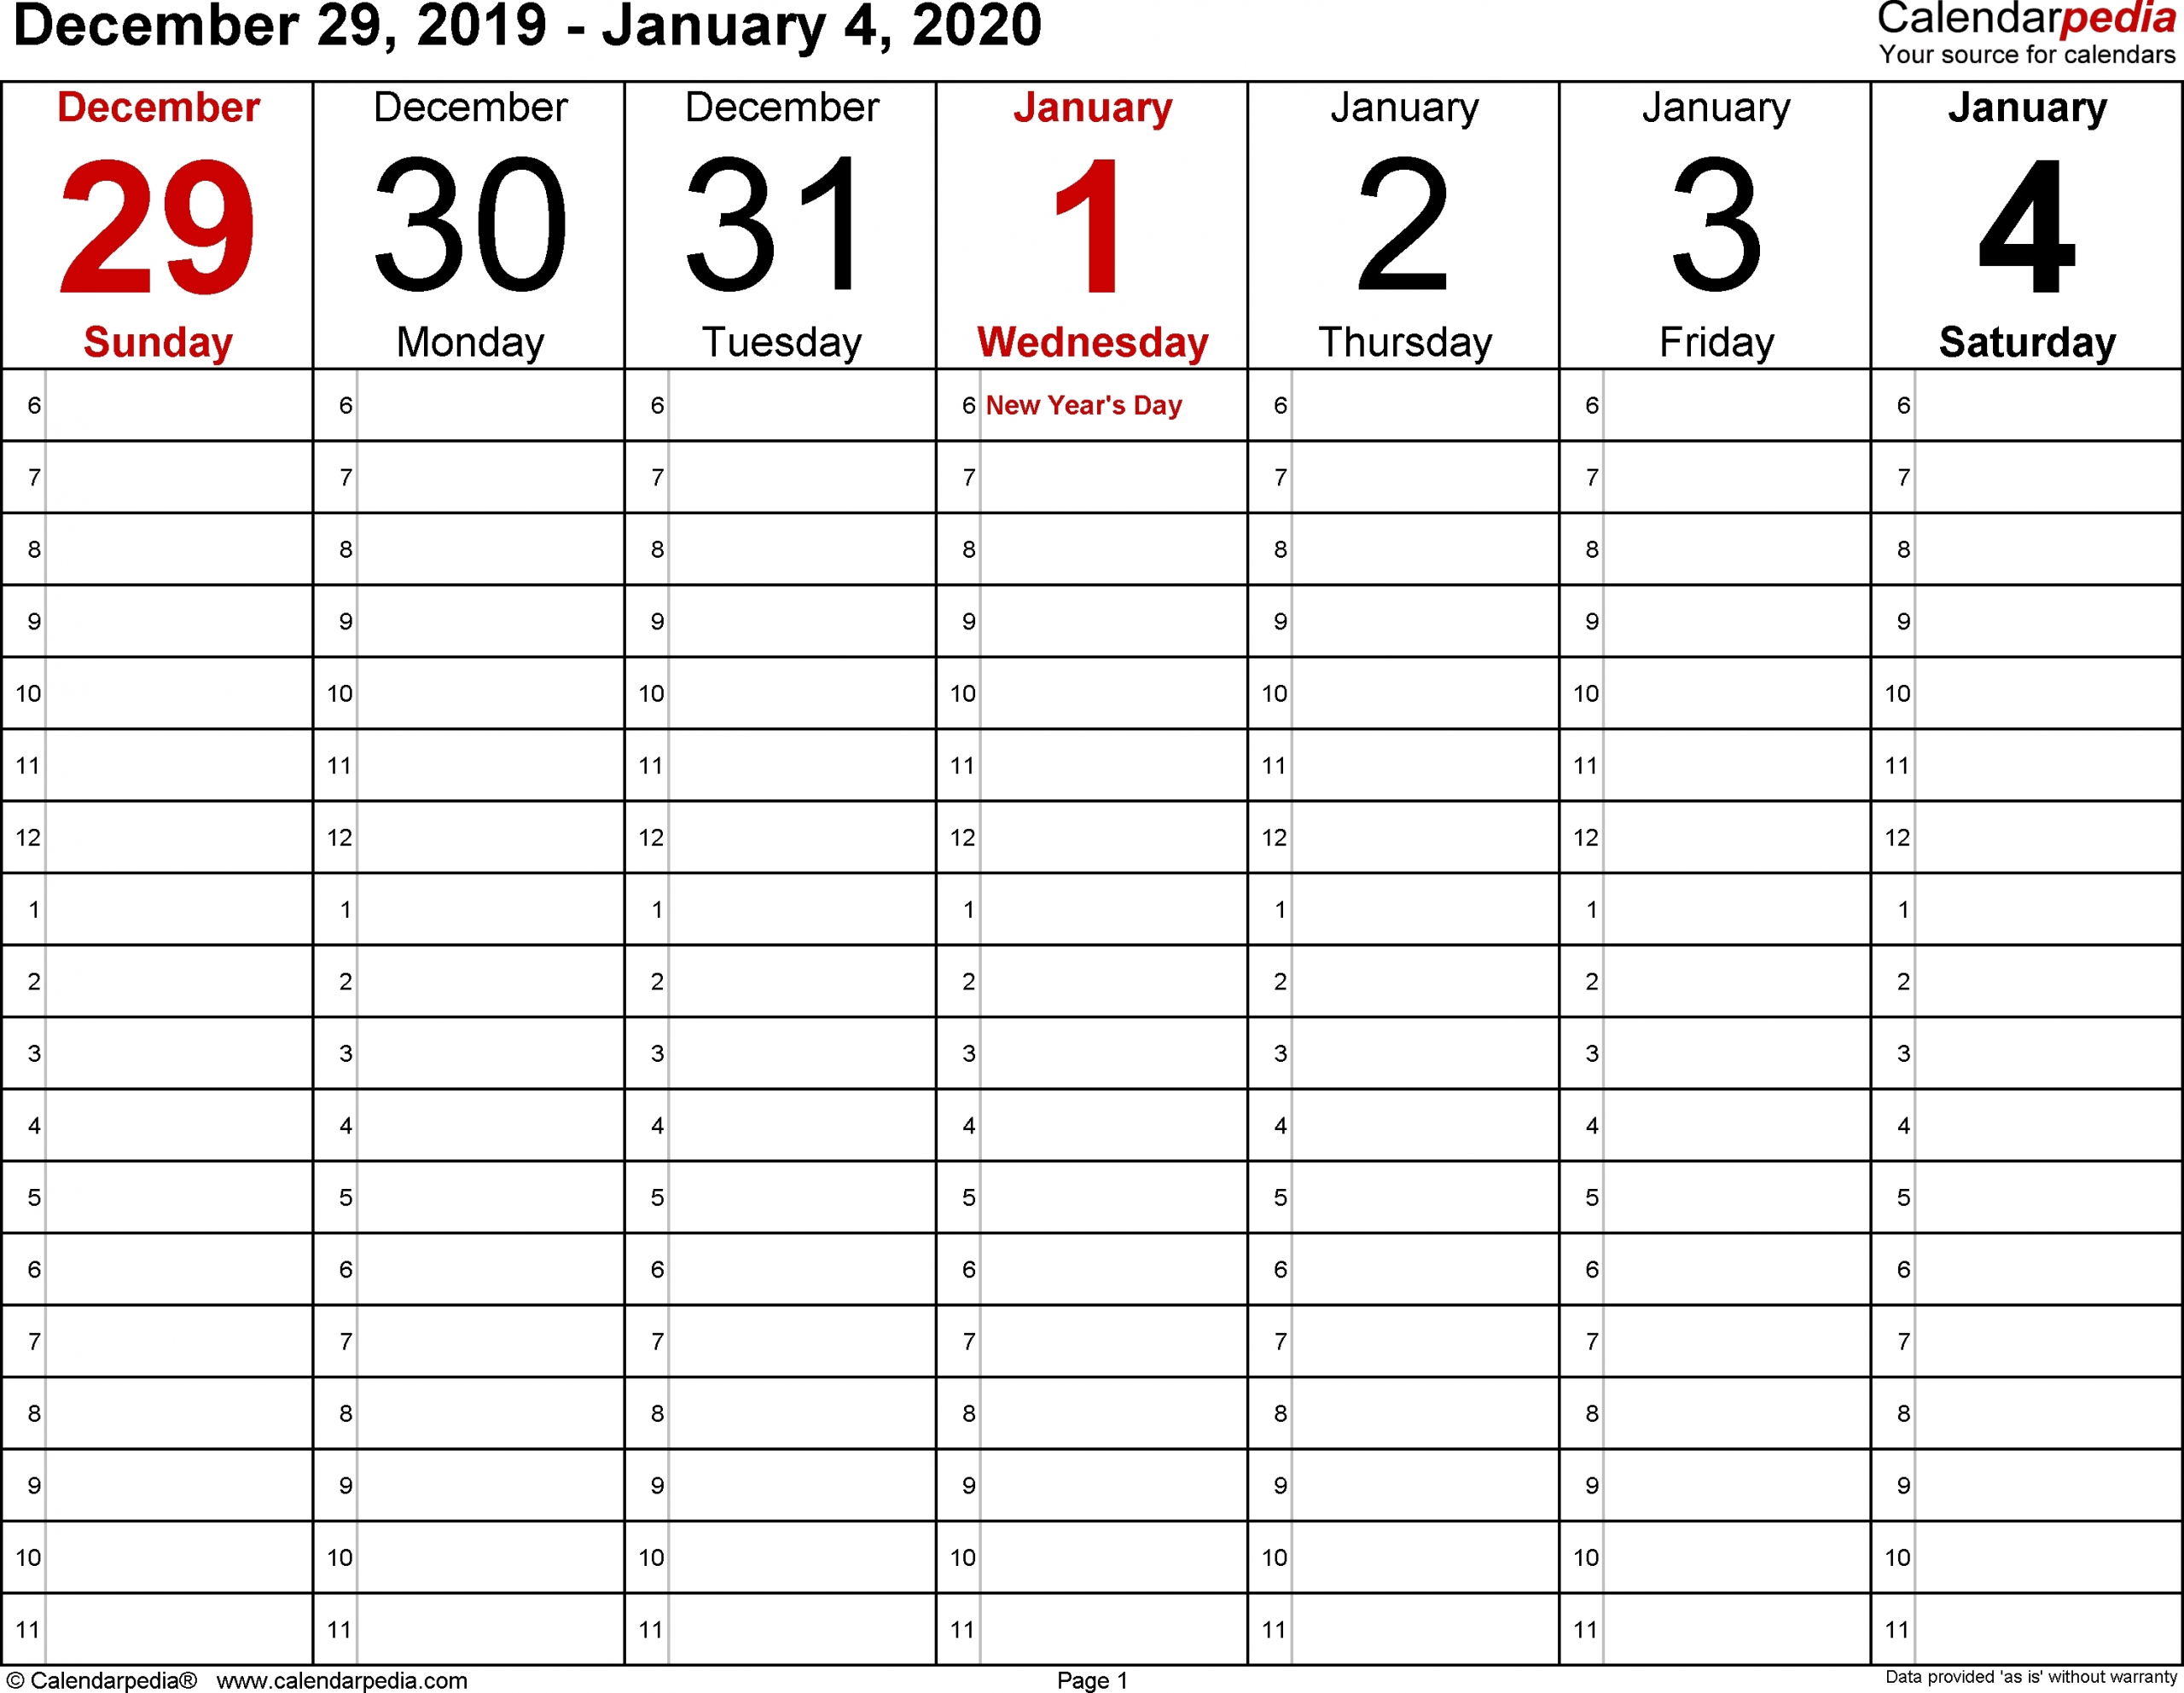 Stephen F Austin 2020-2021 Calendar - Calendar Inspiration throughout Stephen F Austin Calendar 2019-2020